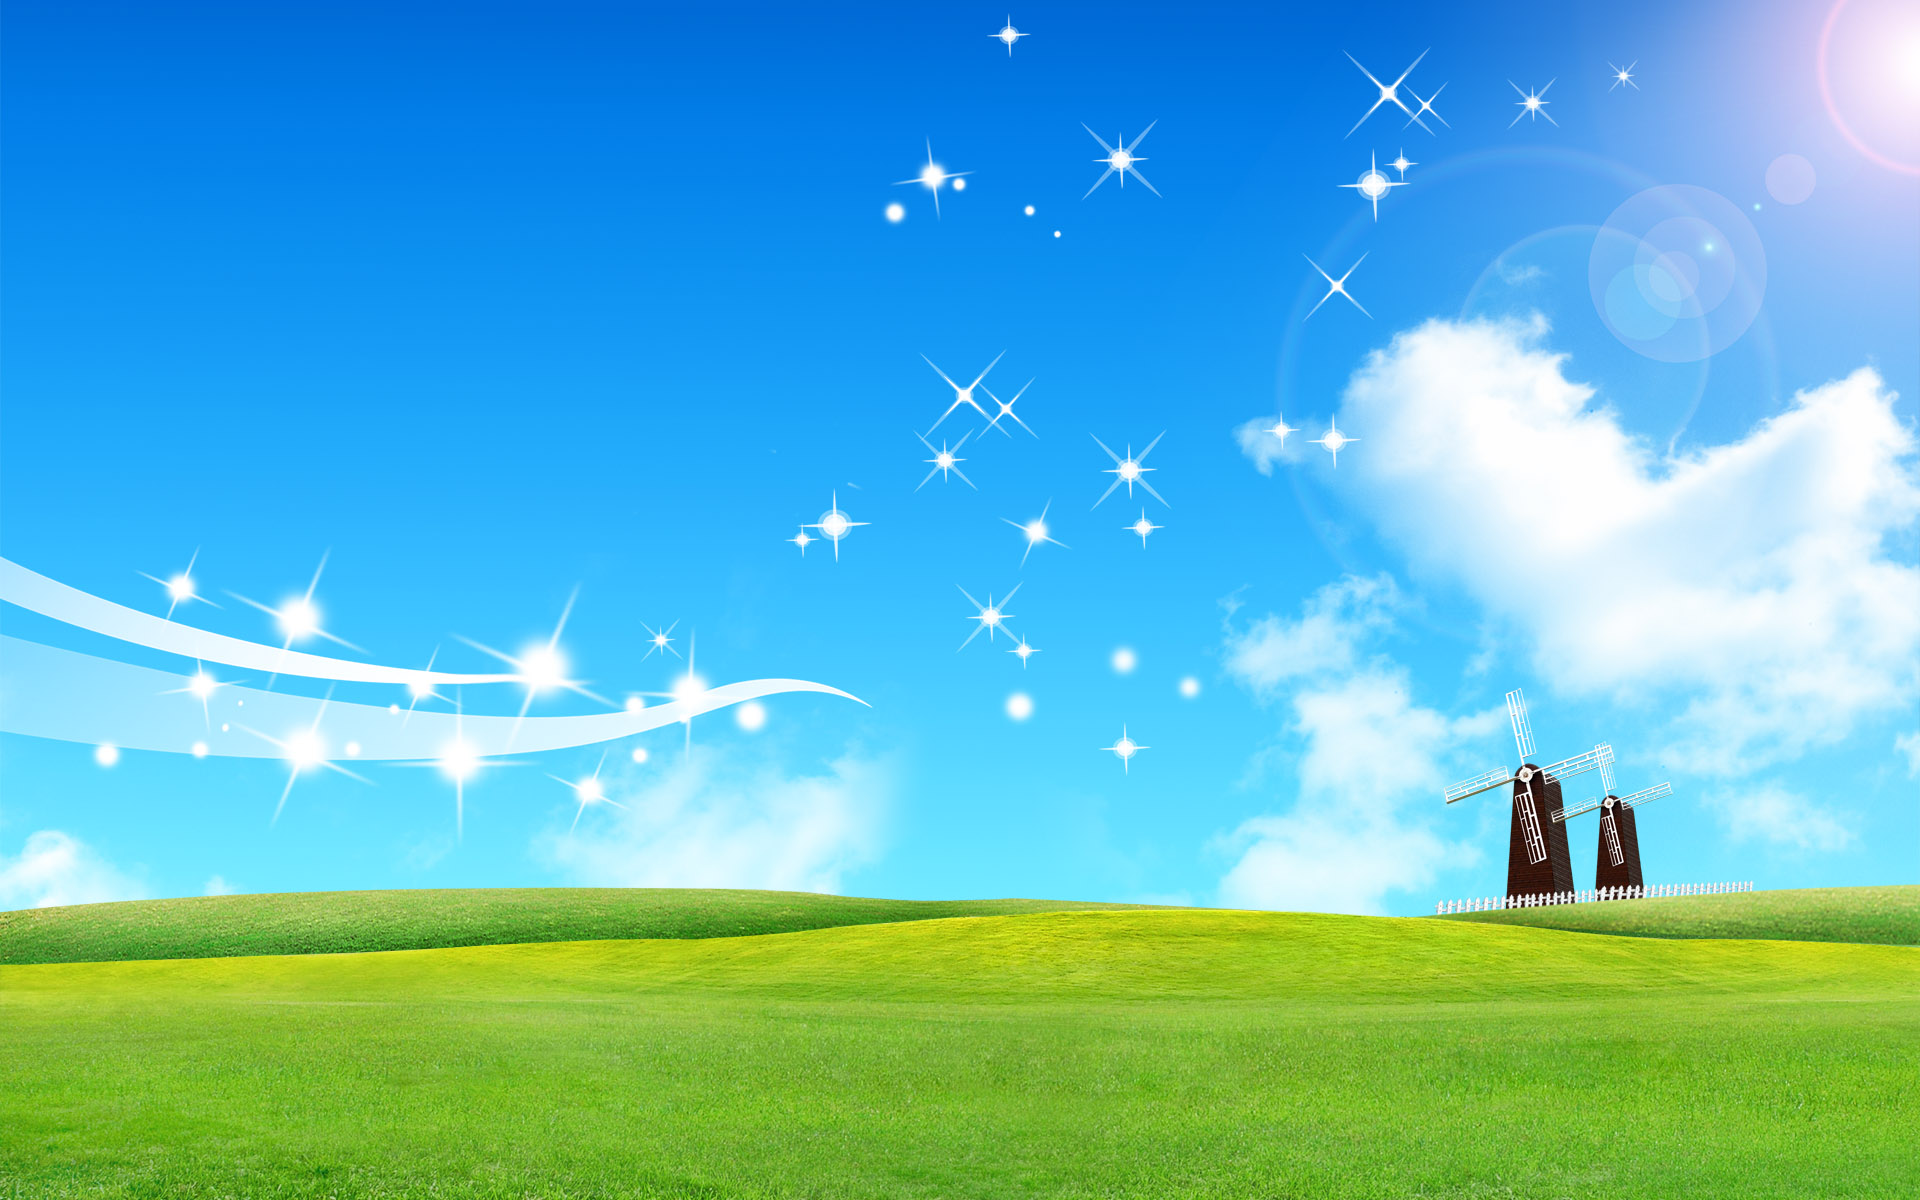 Shining Sky Wallpapers HD Wallpapers 1920x1200